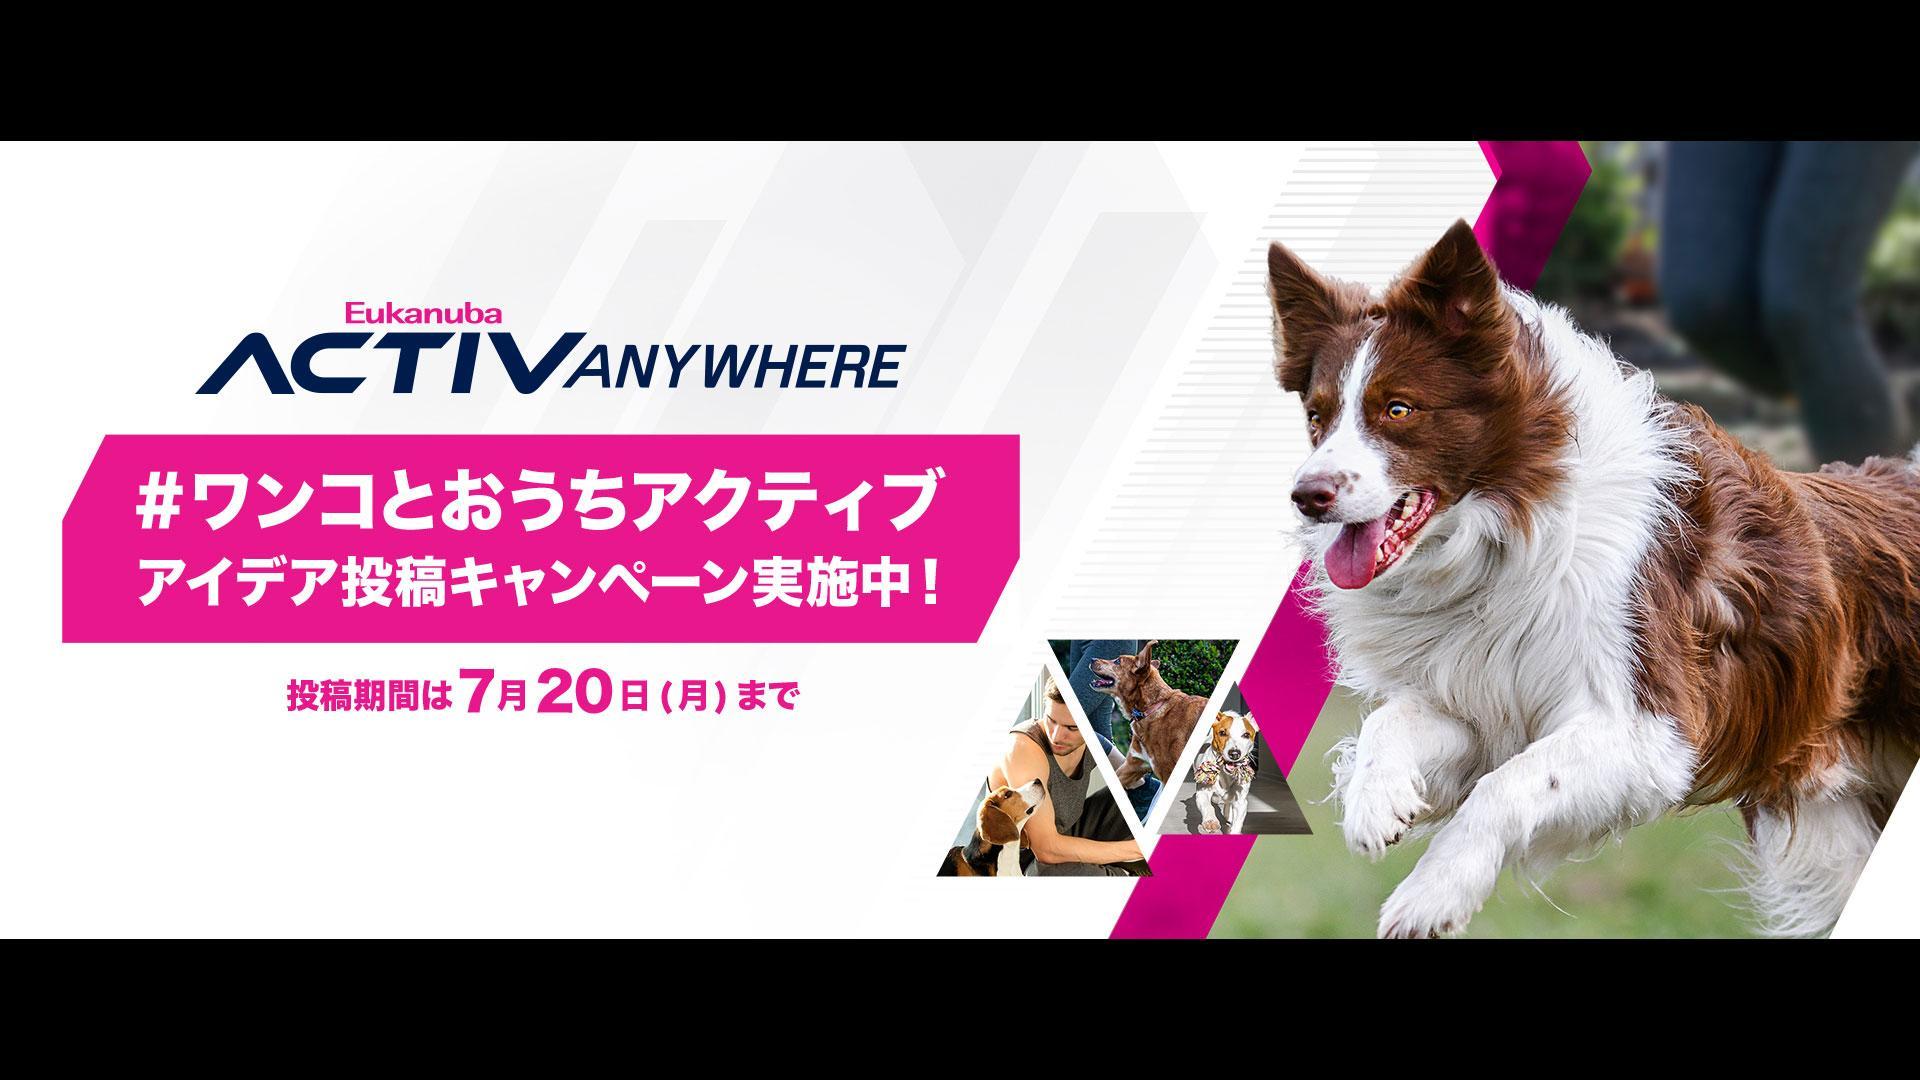 Royal Canin Eukanuba ACTIVANYWHERE Campaign・Contents・Web・PR 制作